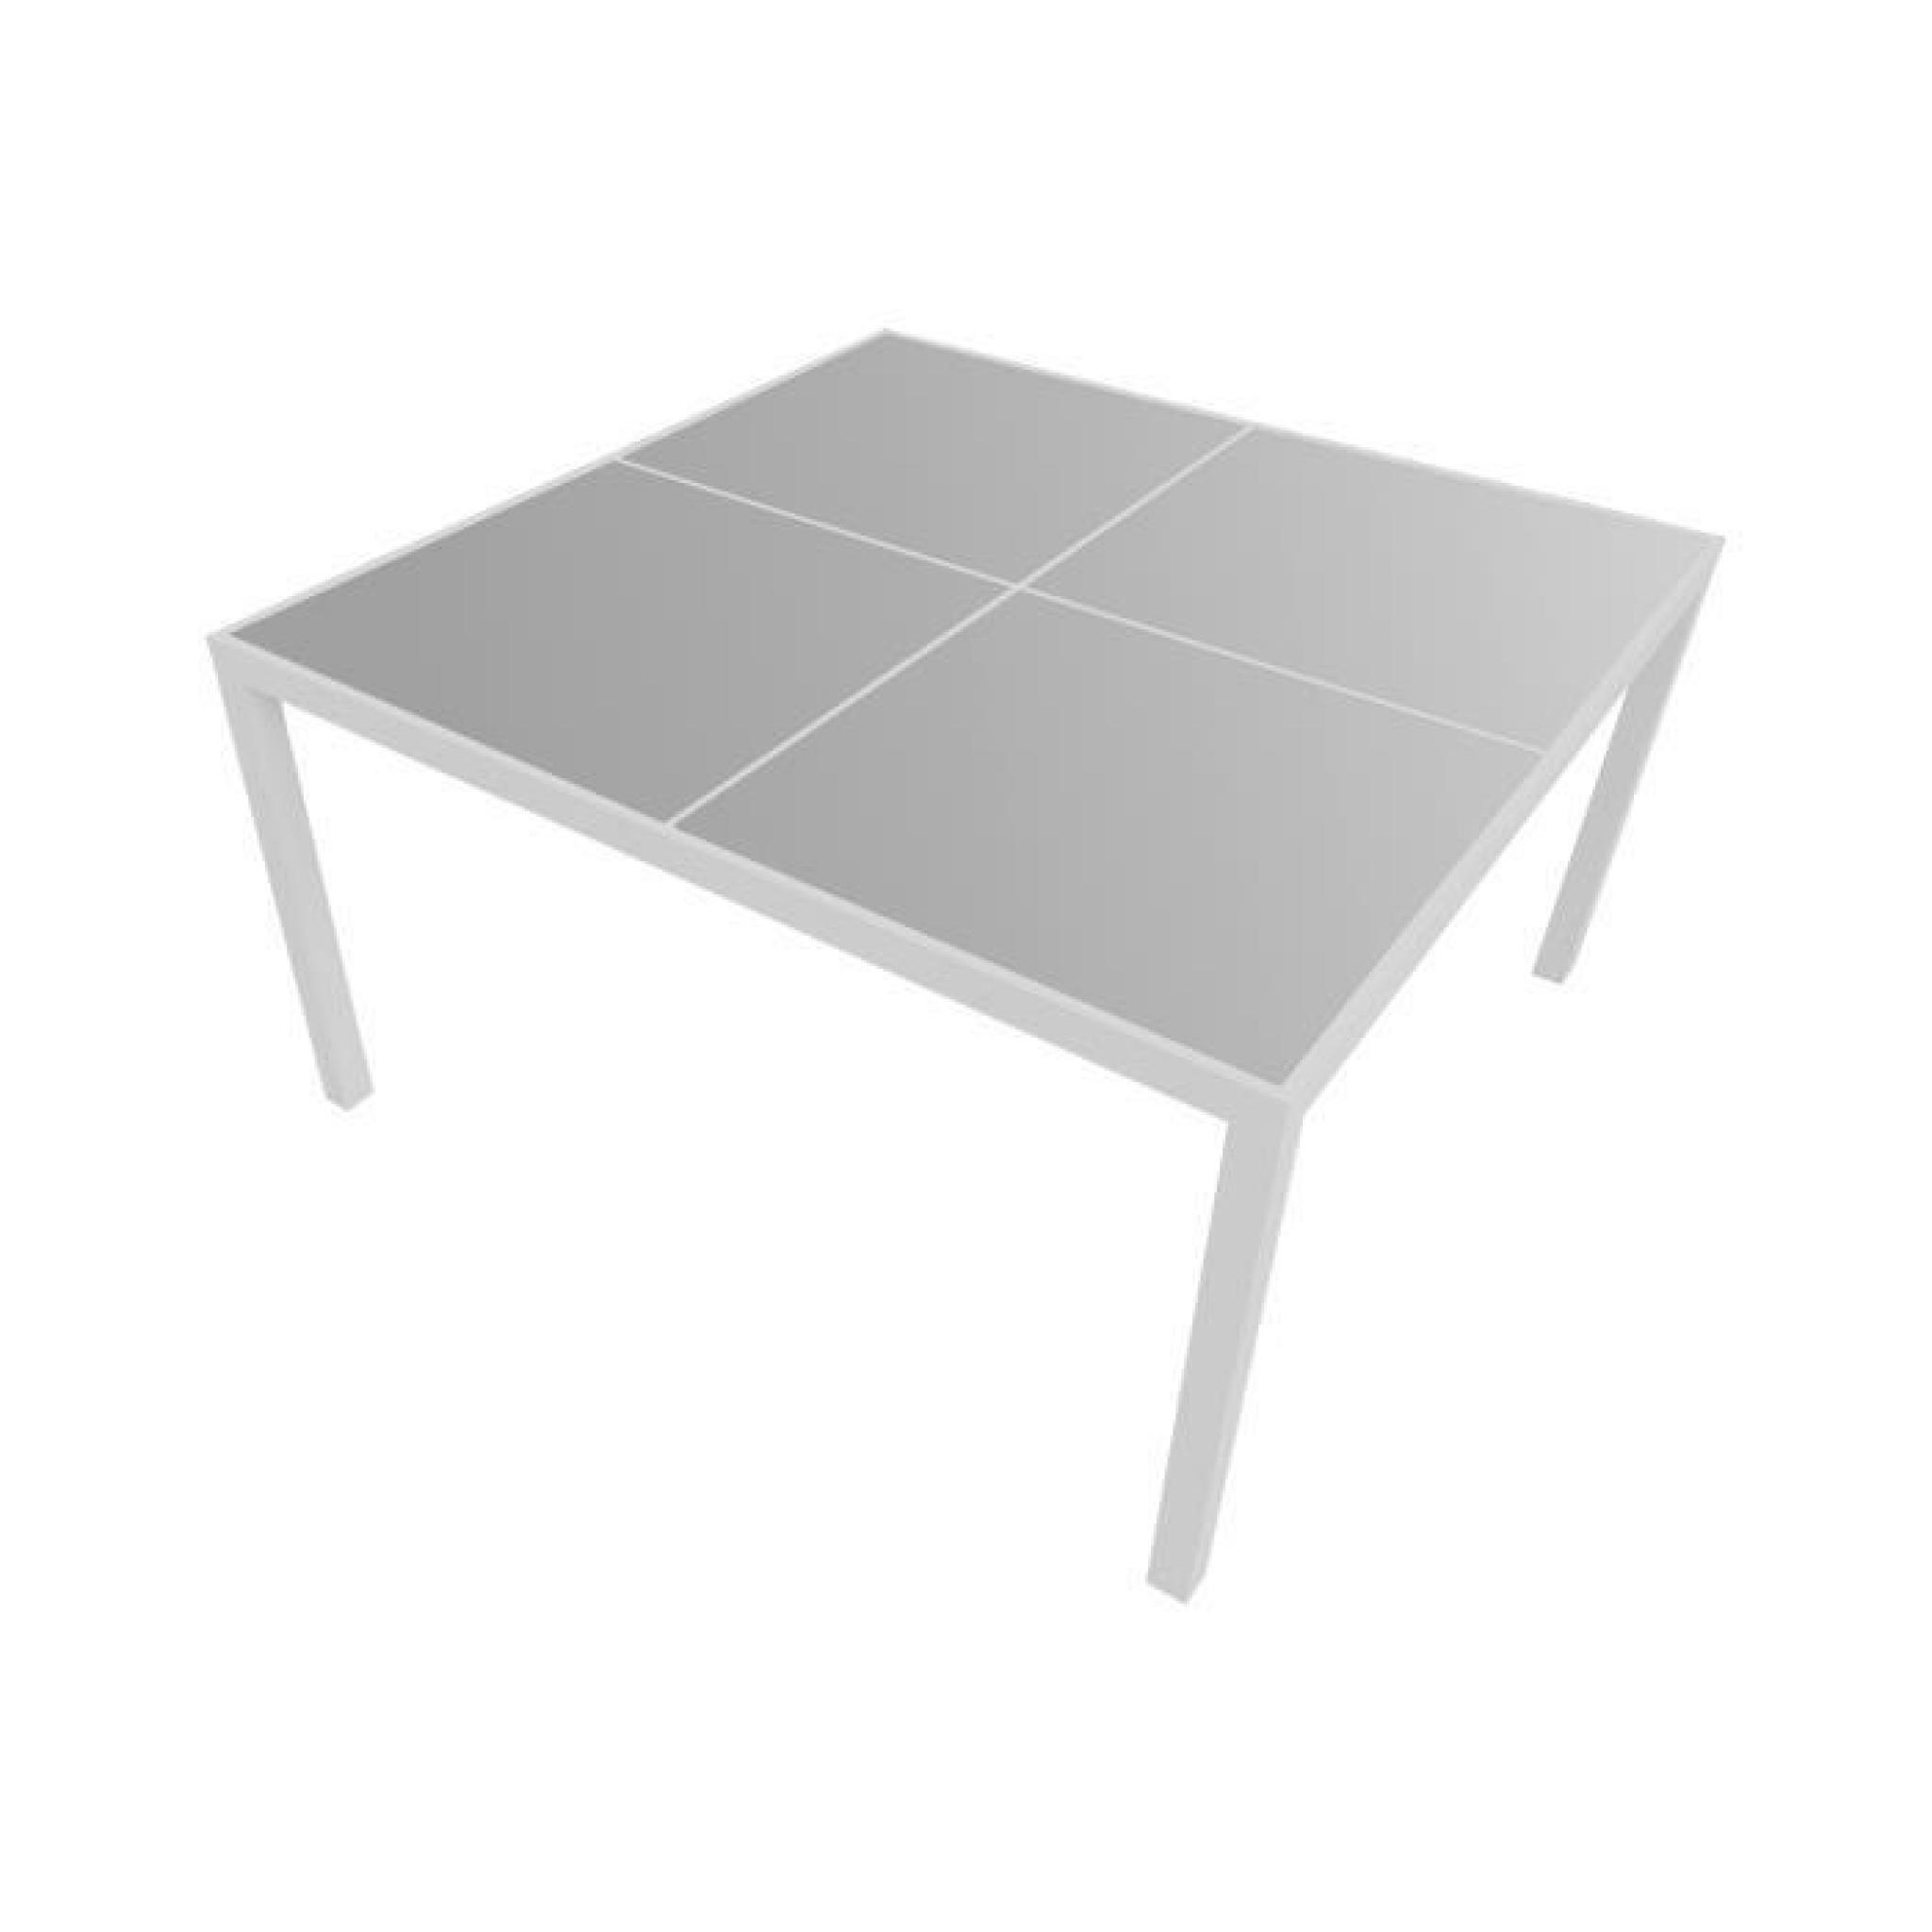 Salon de jardin CAGLIARI en textilène gris 8 places - aluminium ...